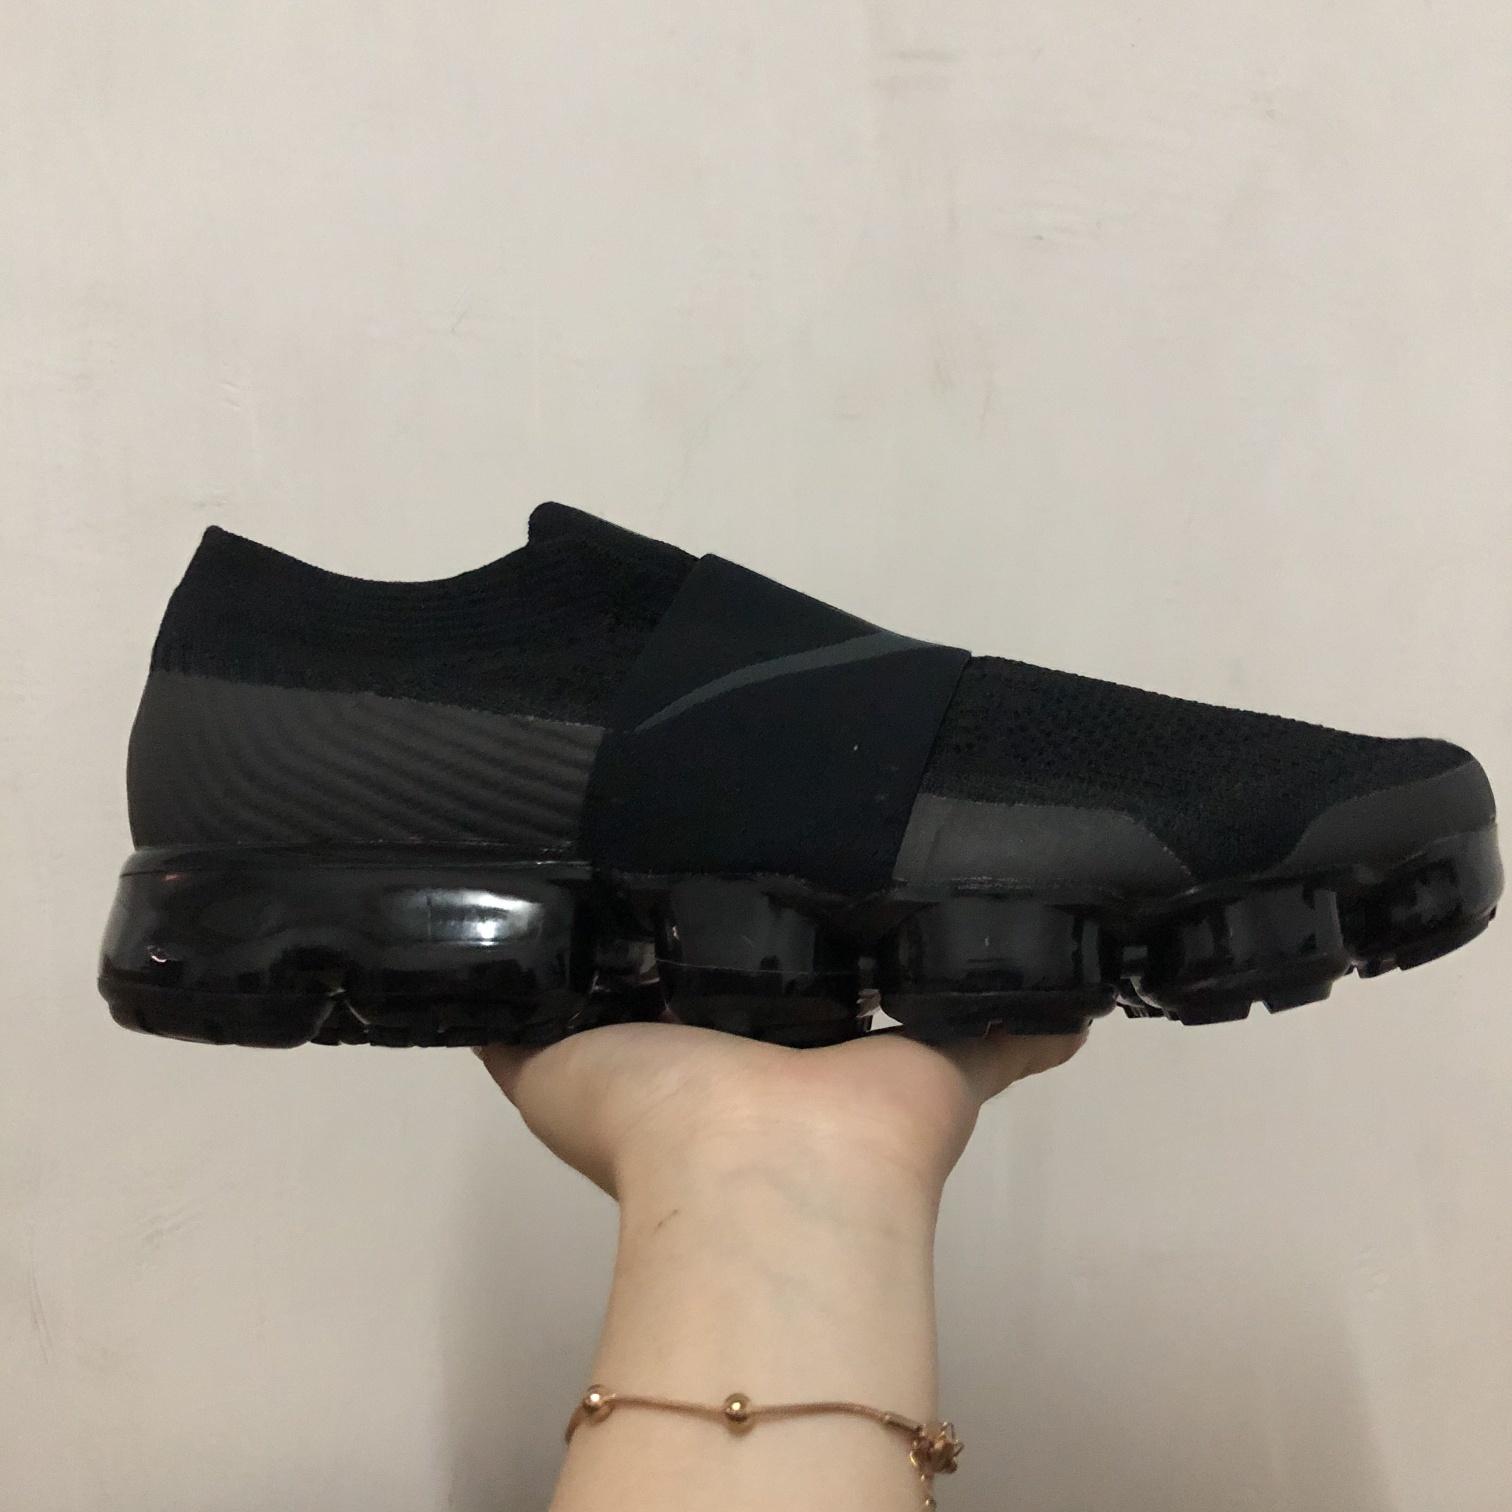 NIKE AIR VAPORMAX MOC 全黑 无鞋带绑带大气垫跑步鞋